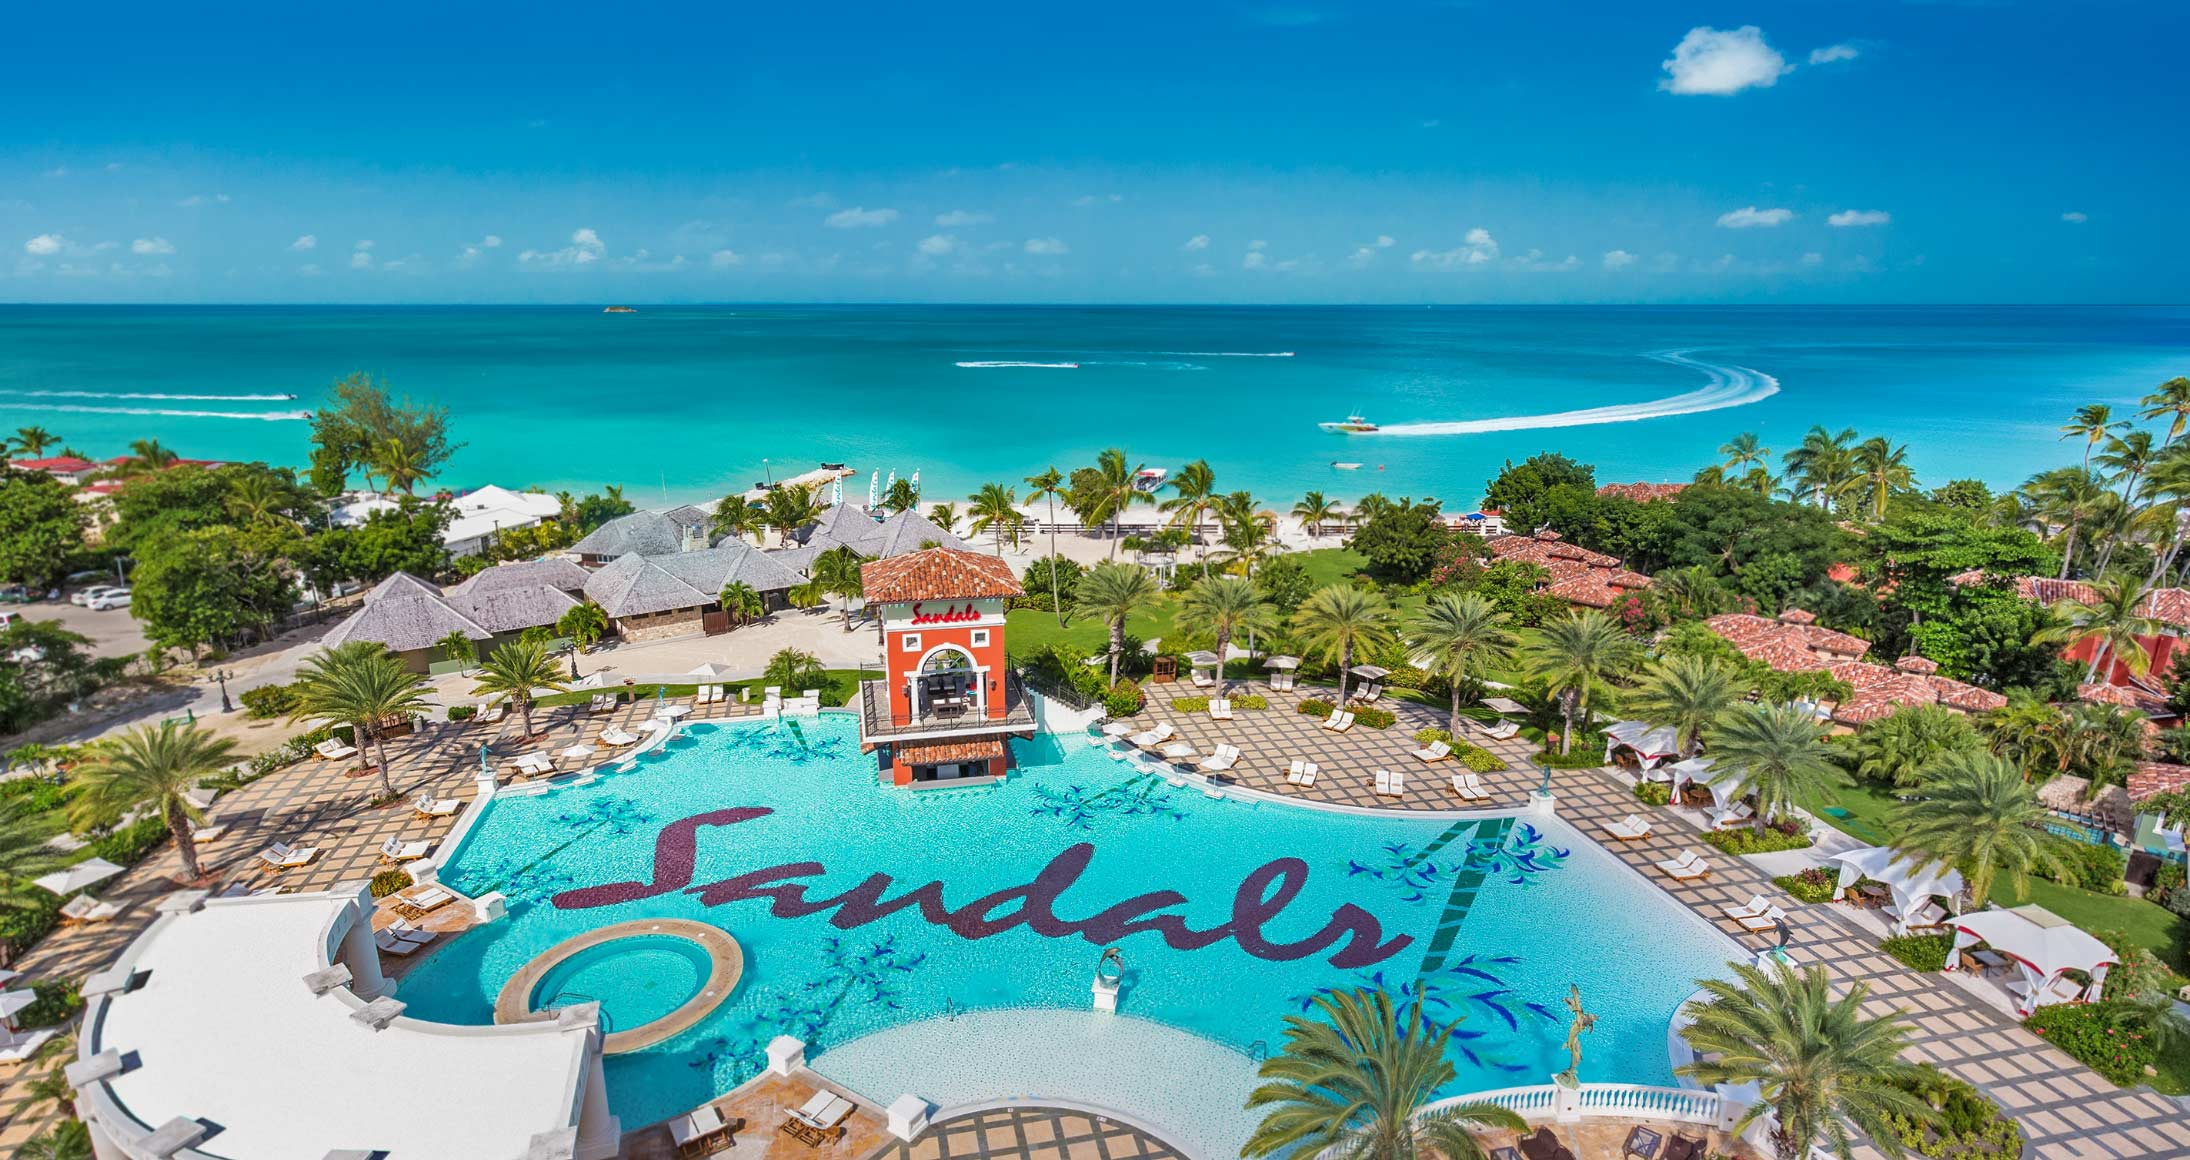 sandals aerial pool beach ocean boat resort